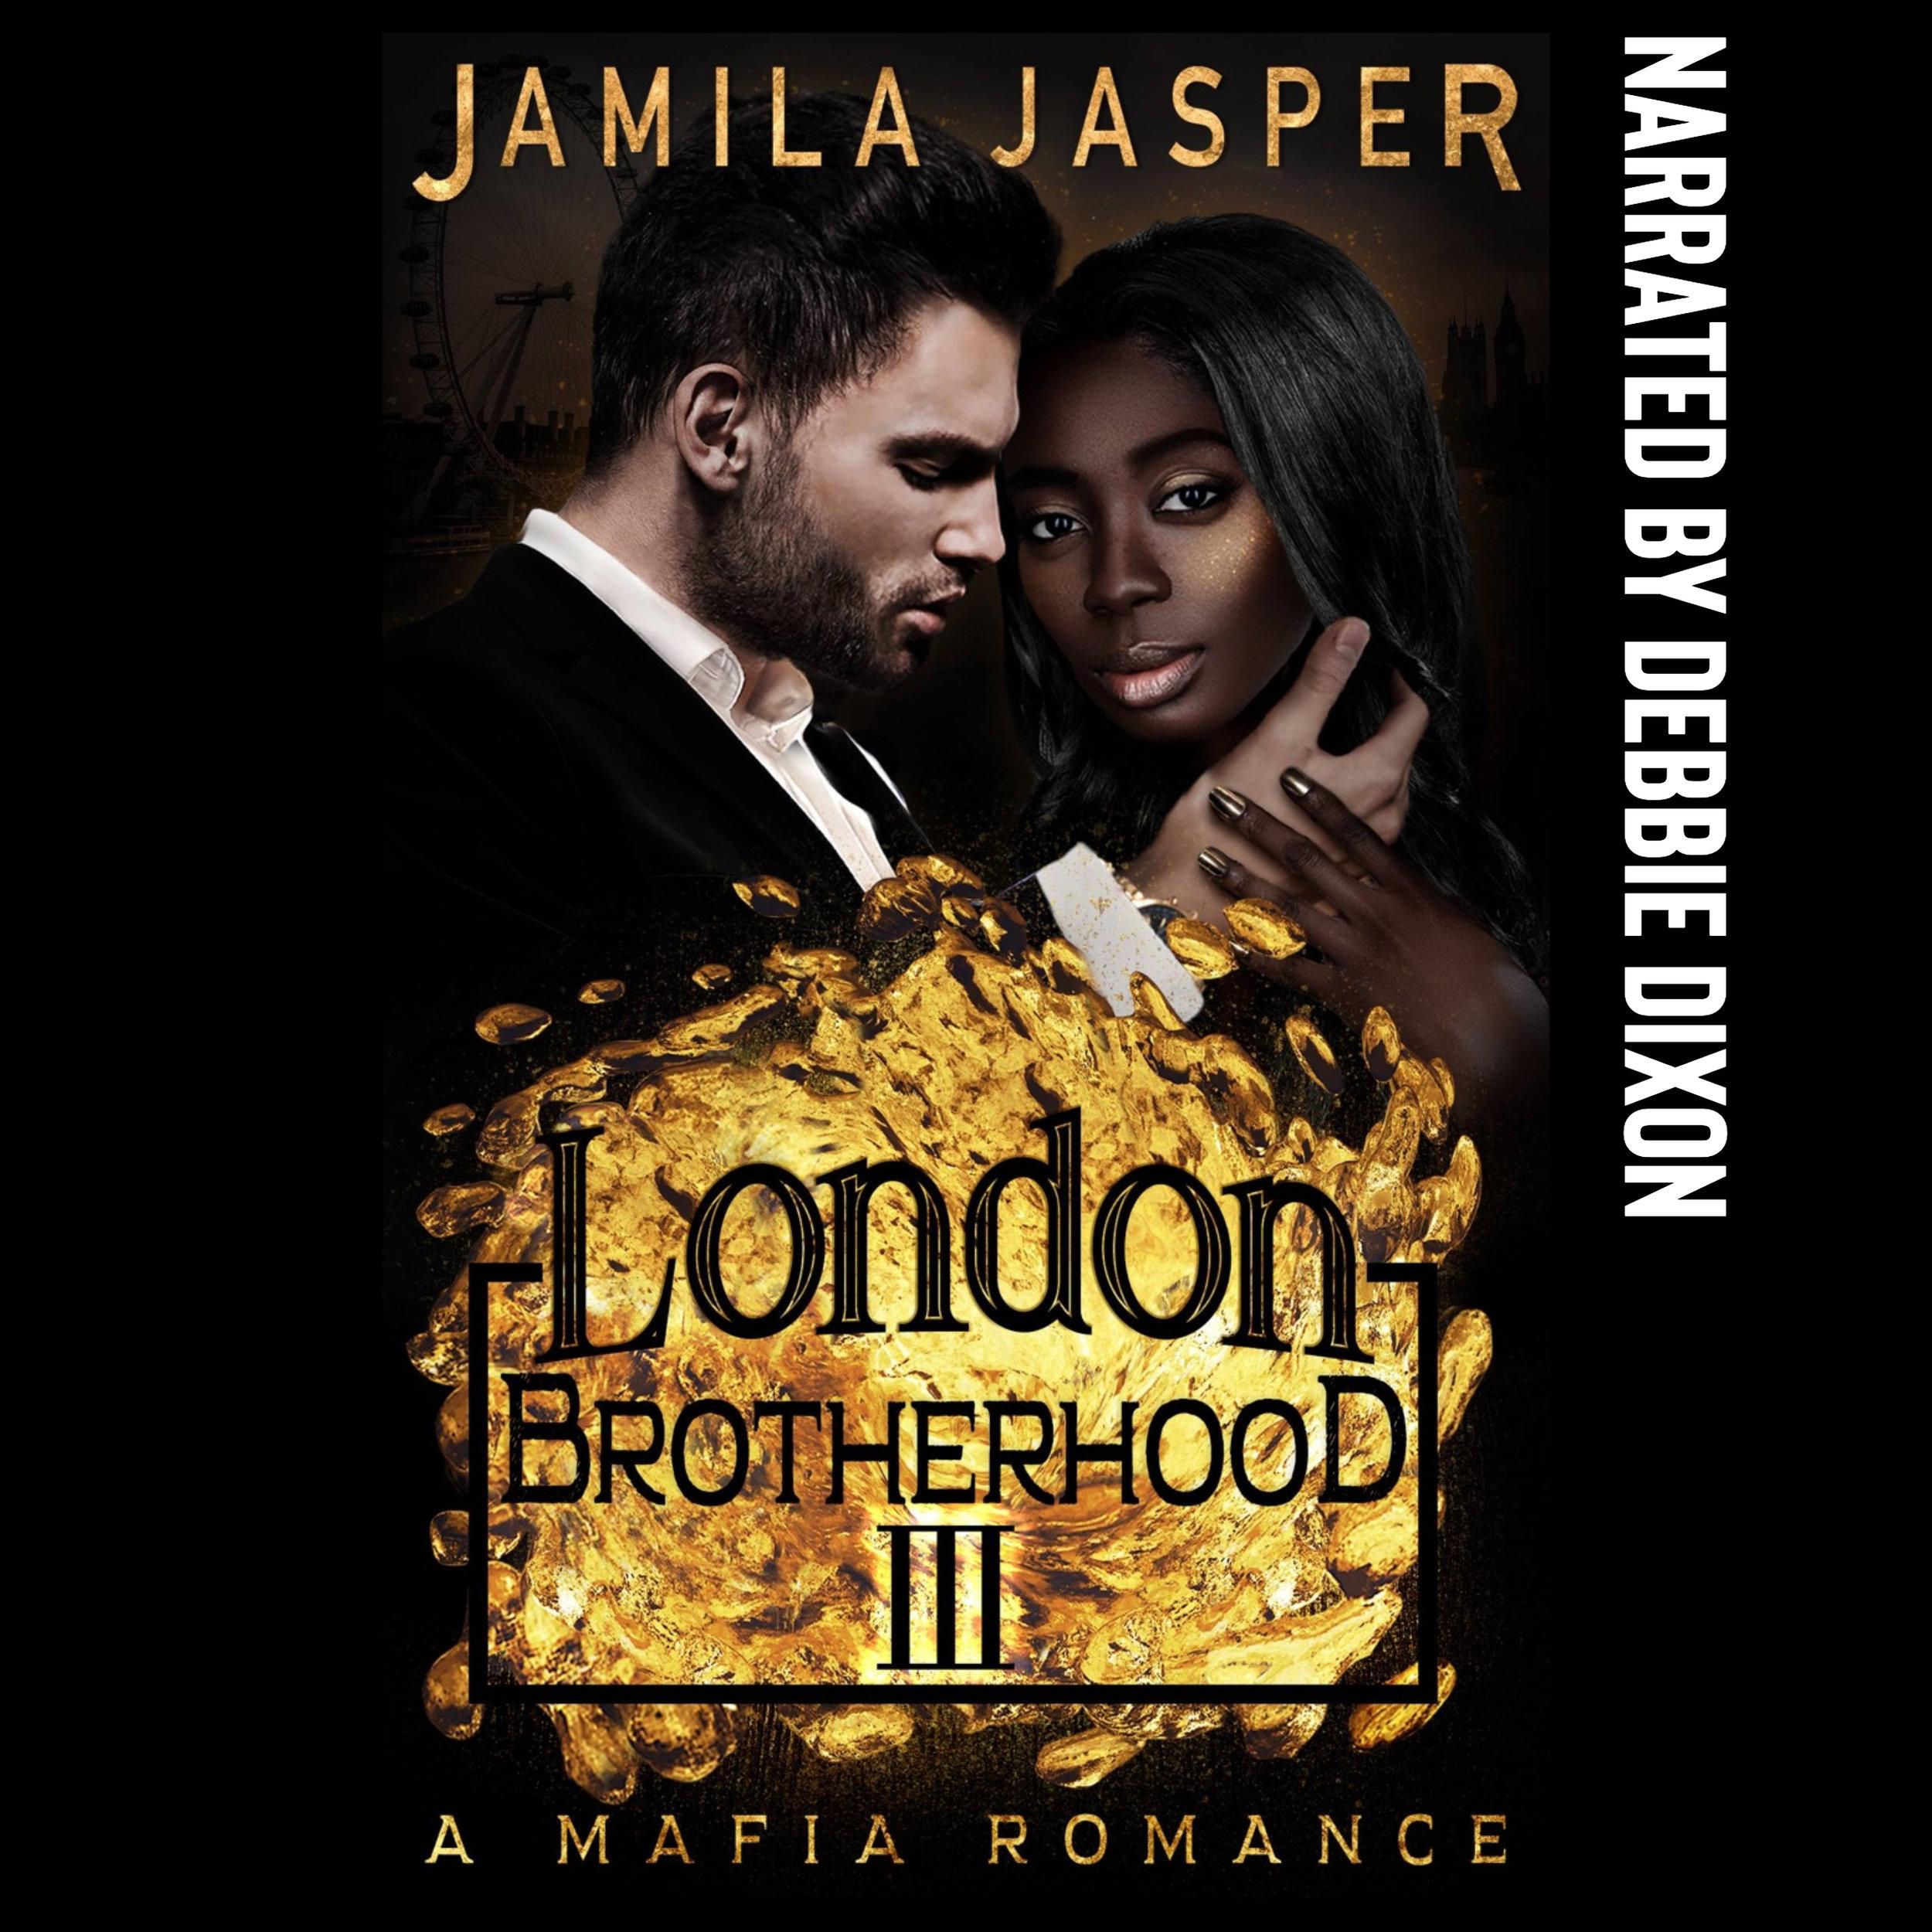 london brotherhood iii audiobook cover FINAL.jpg